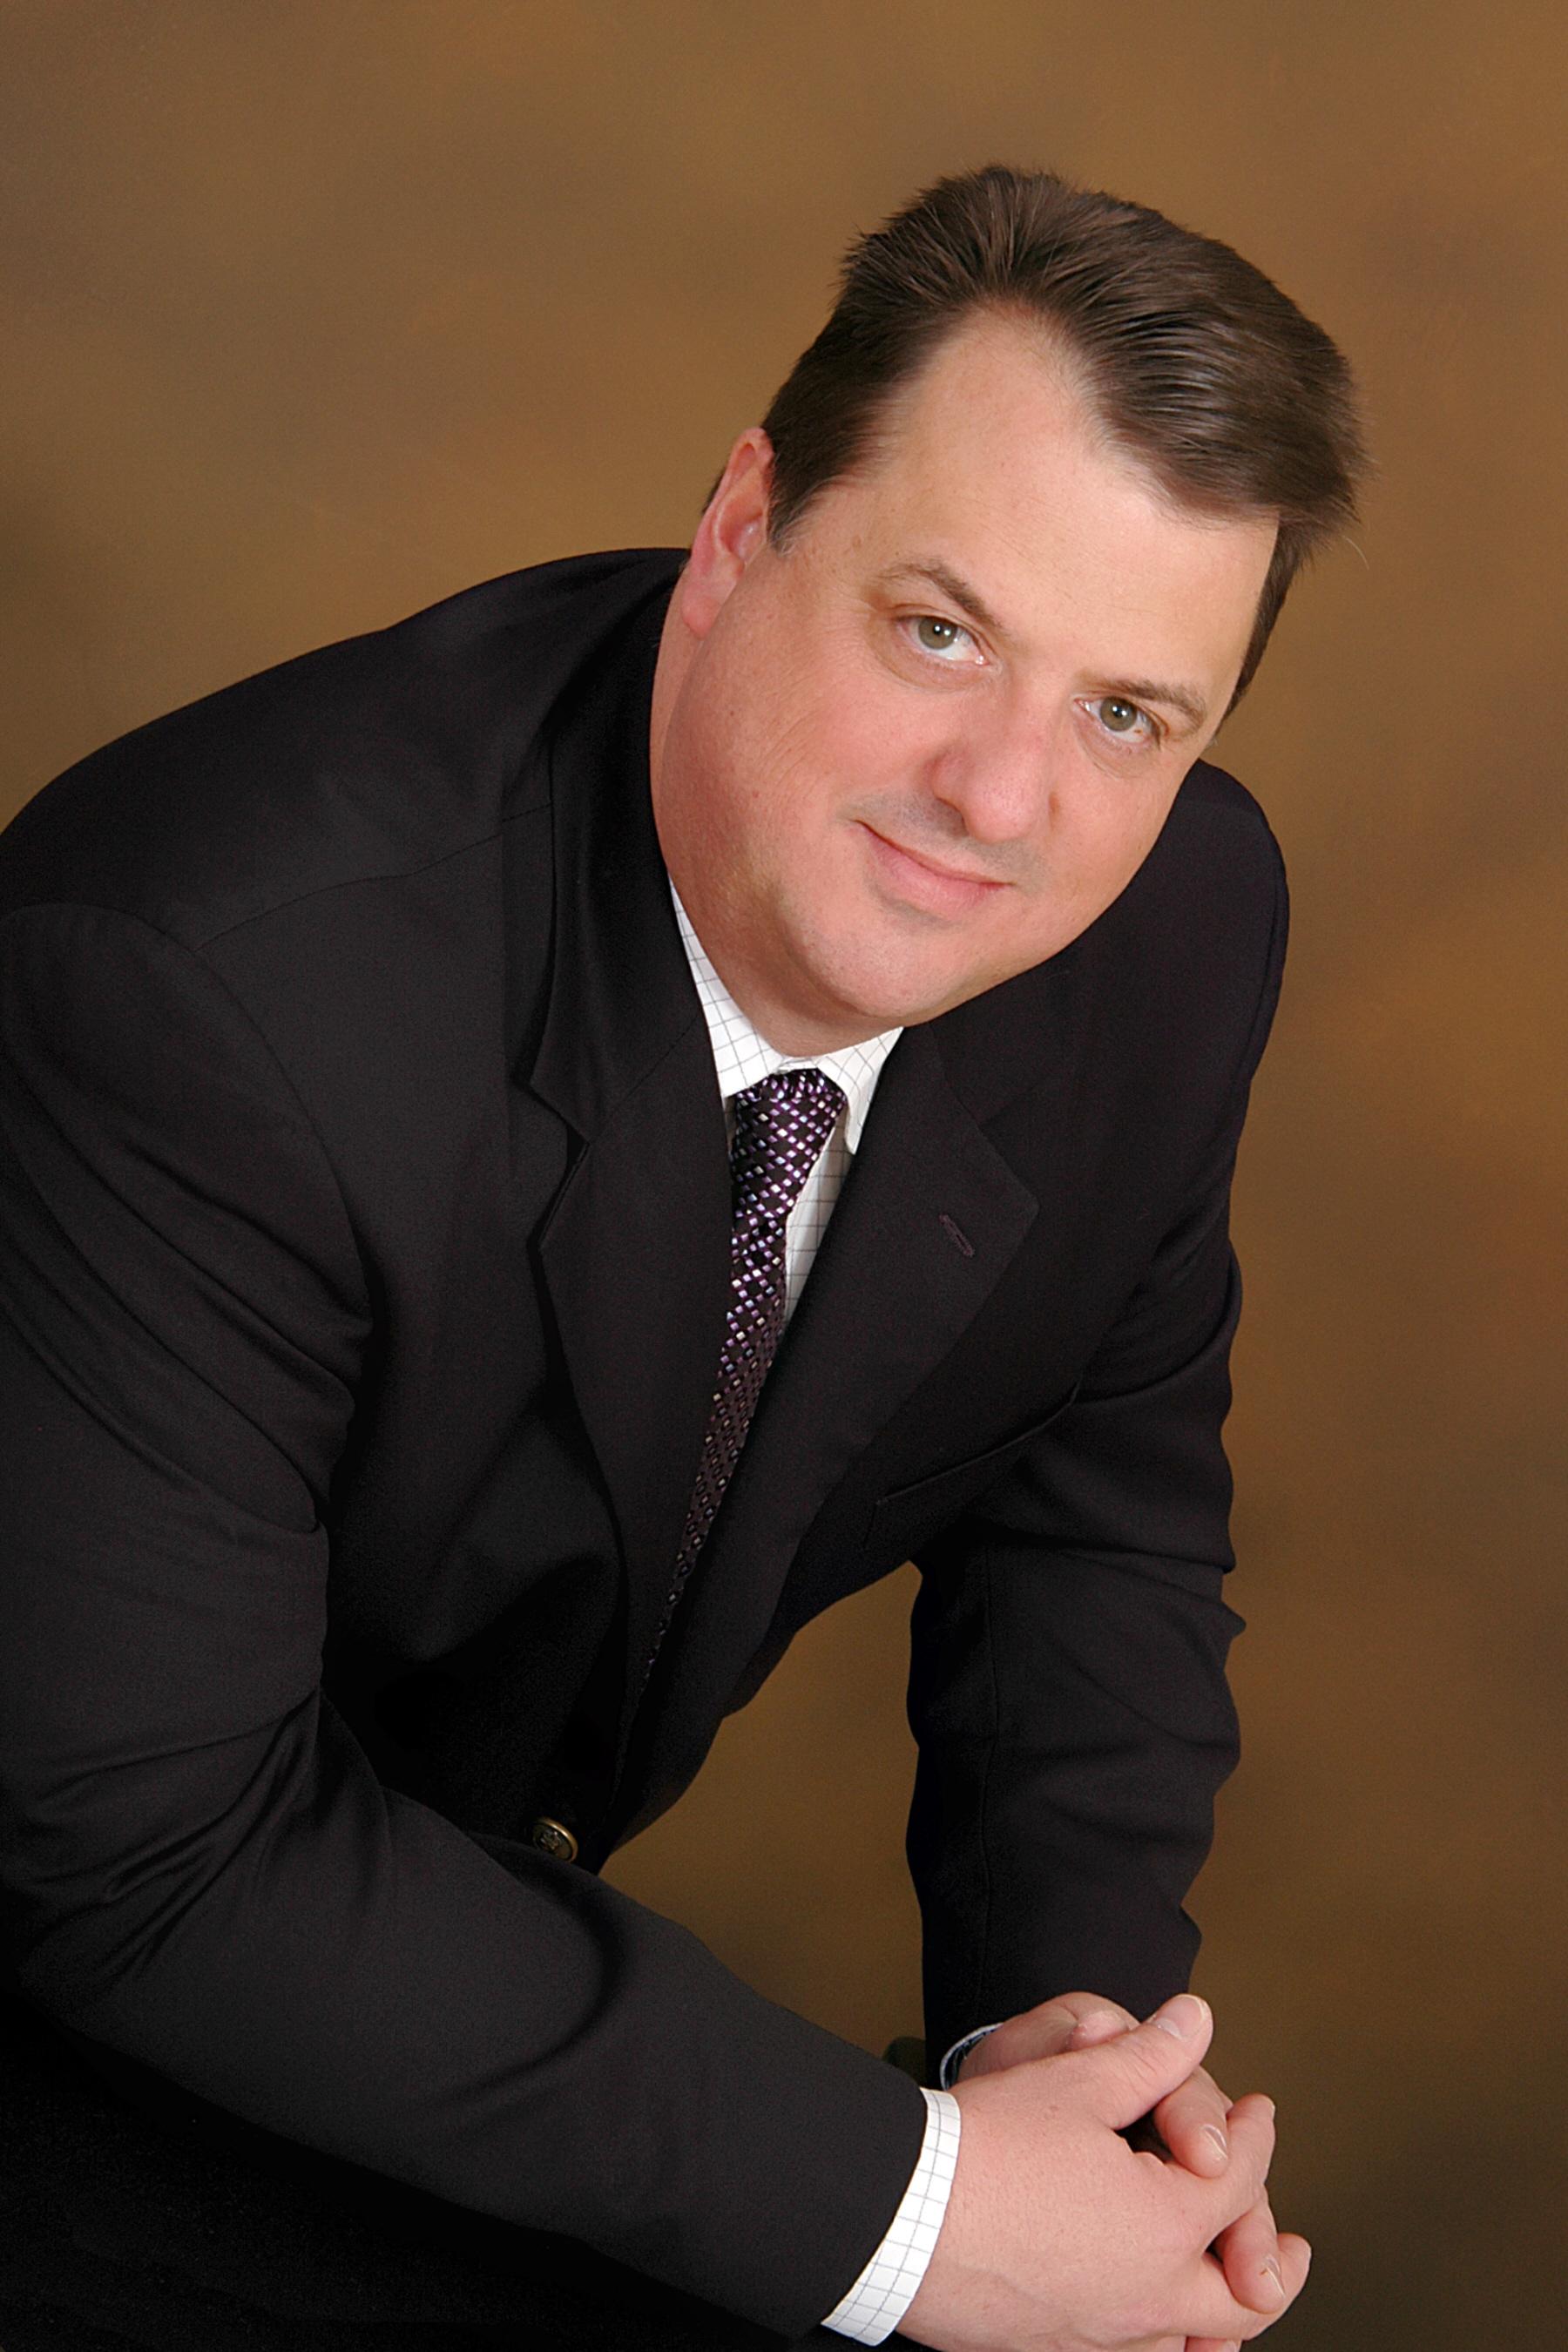 John D. Doehring, CMC, MBA   Managing Principal, J. Doehring & Co.